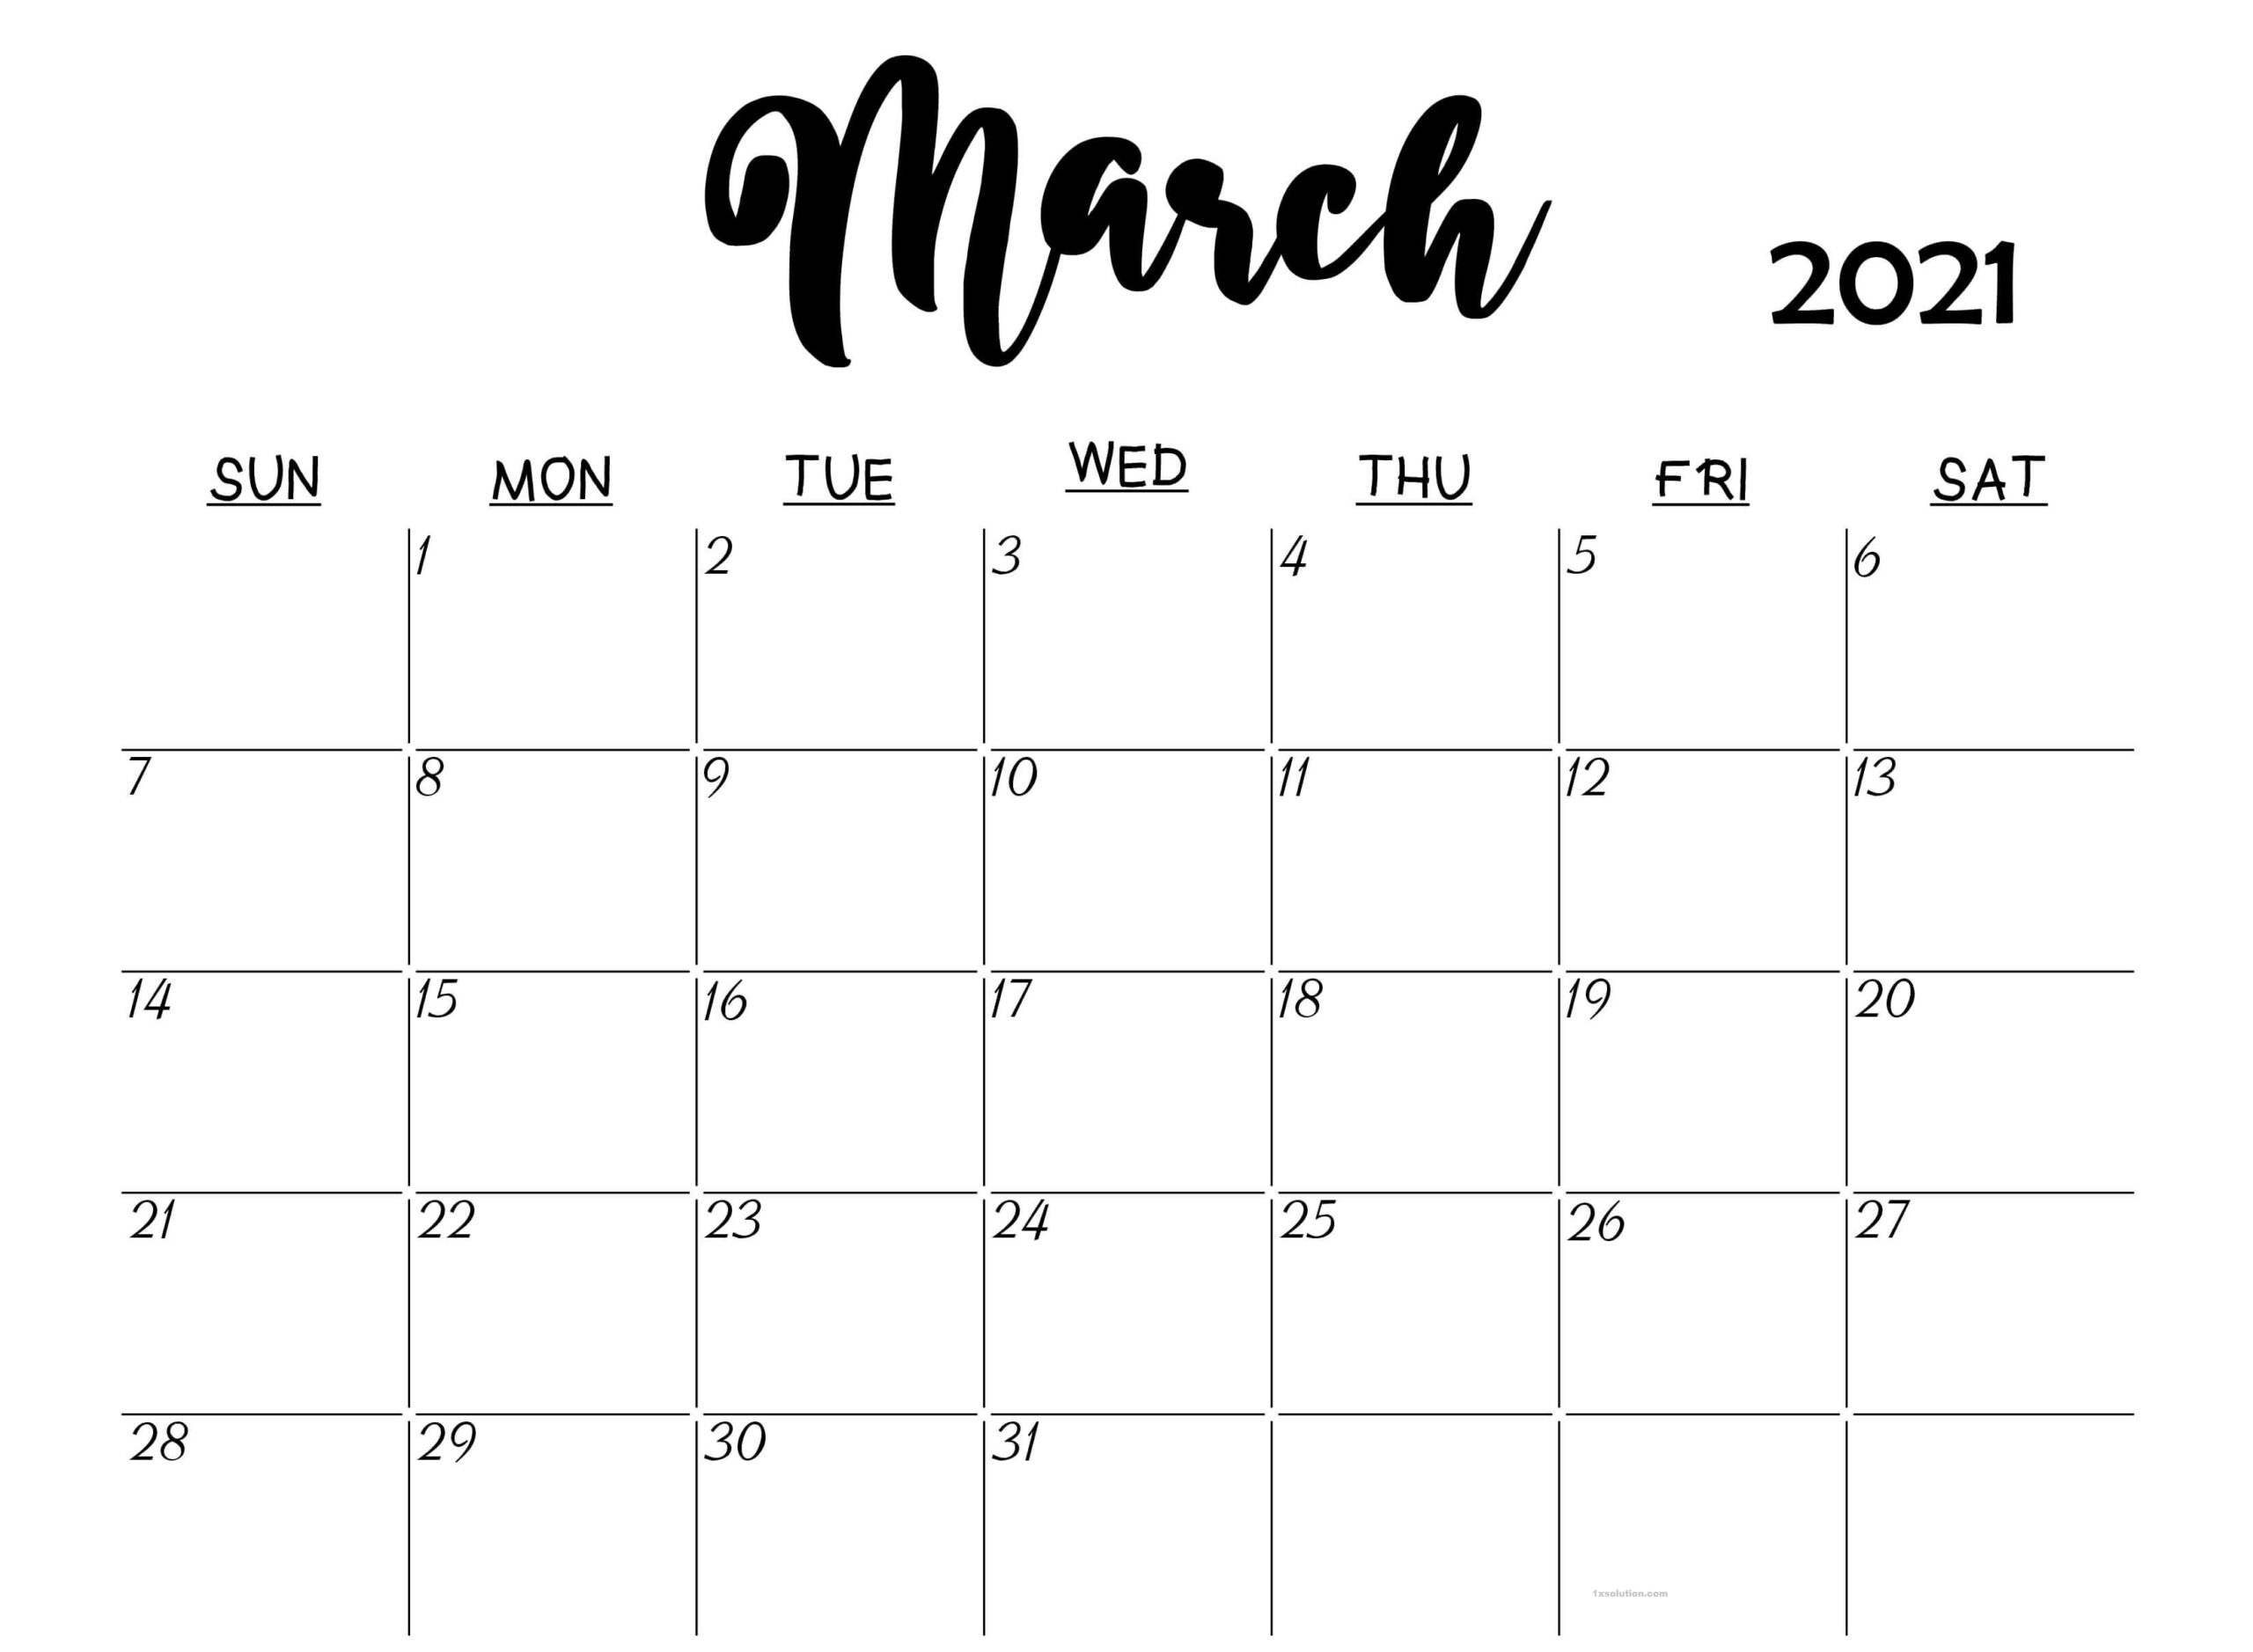 Cute March 2021 Calendar For Office